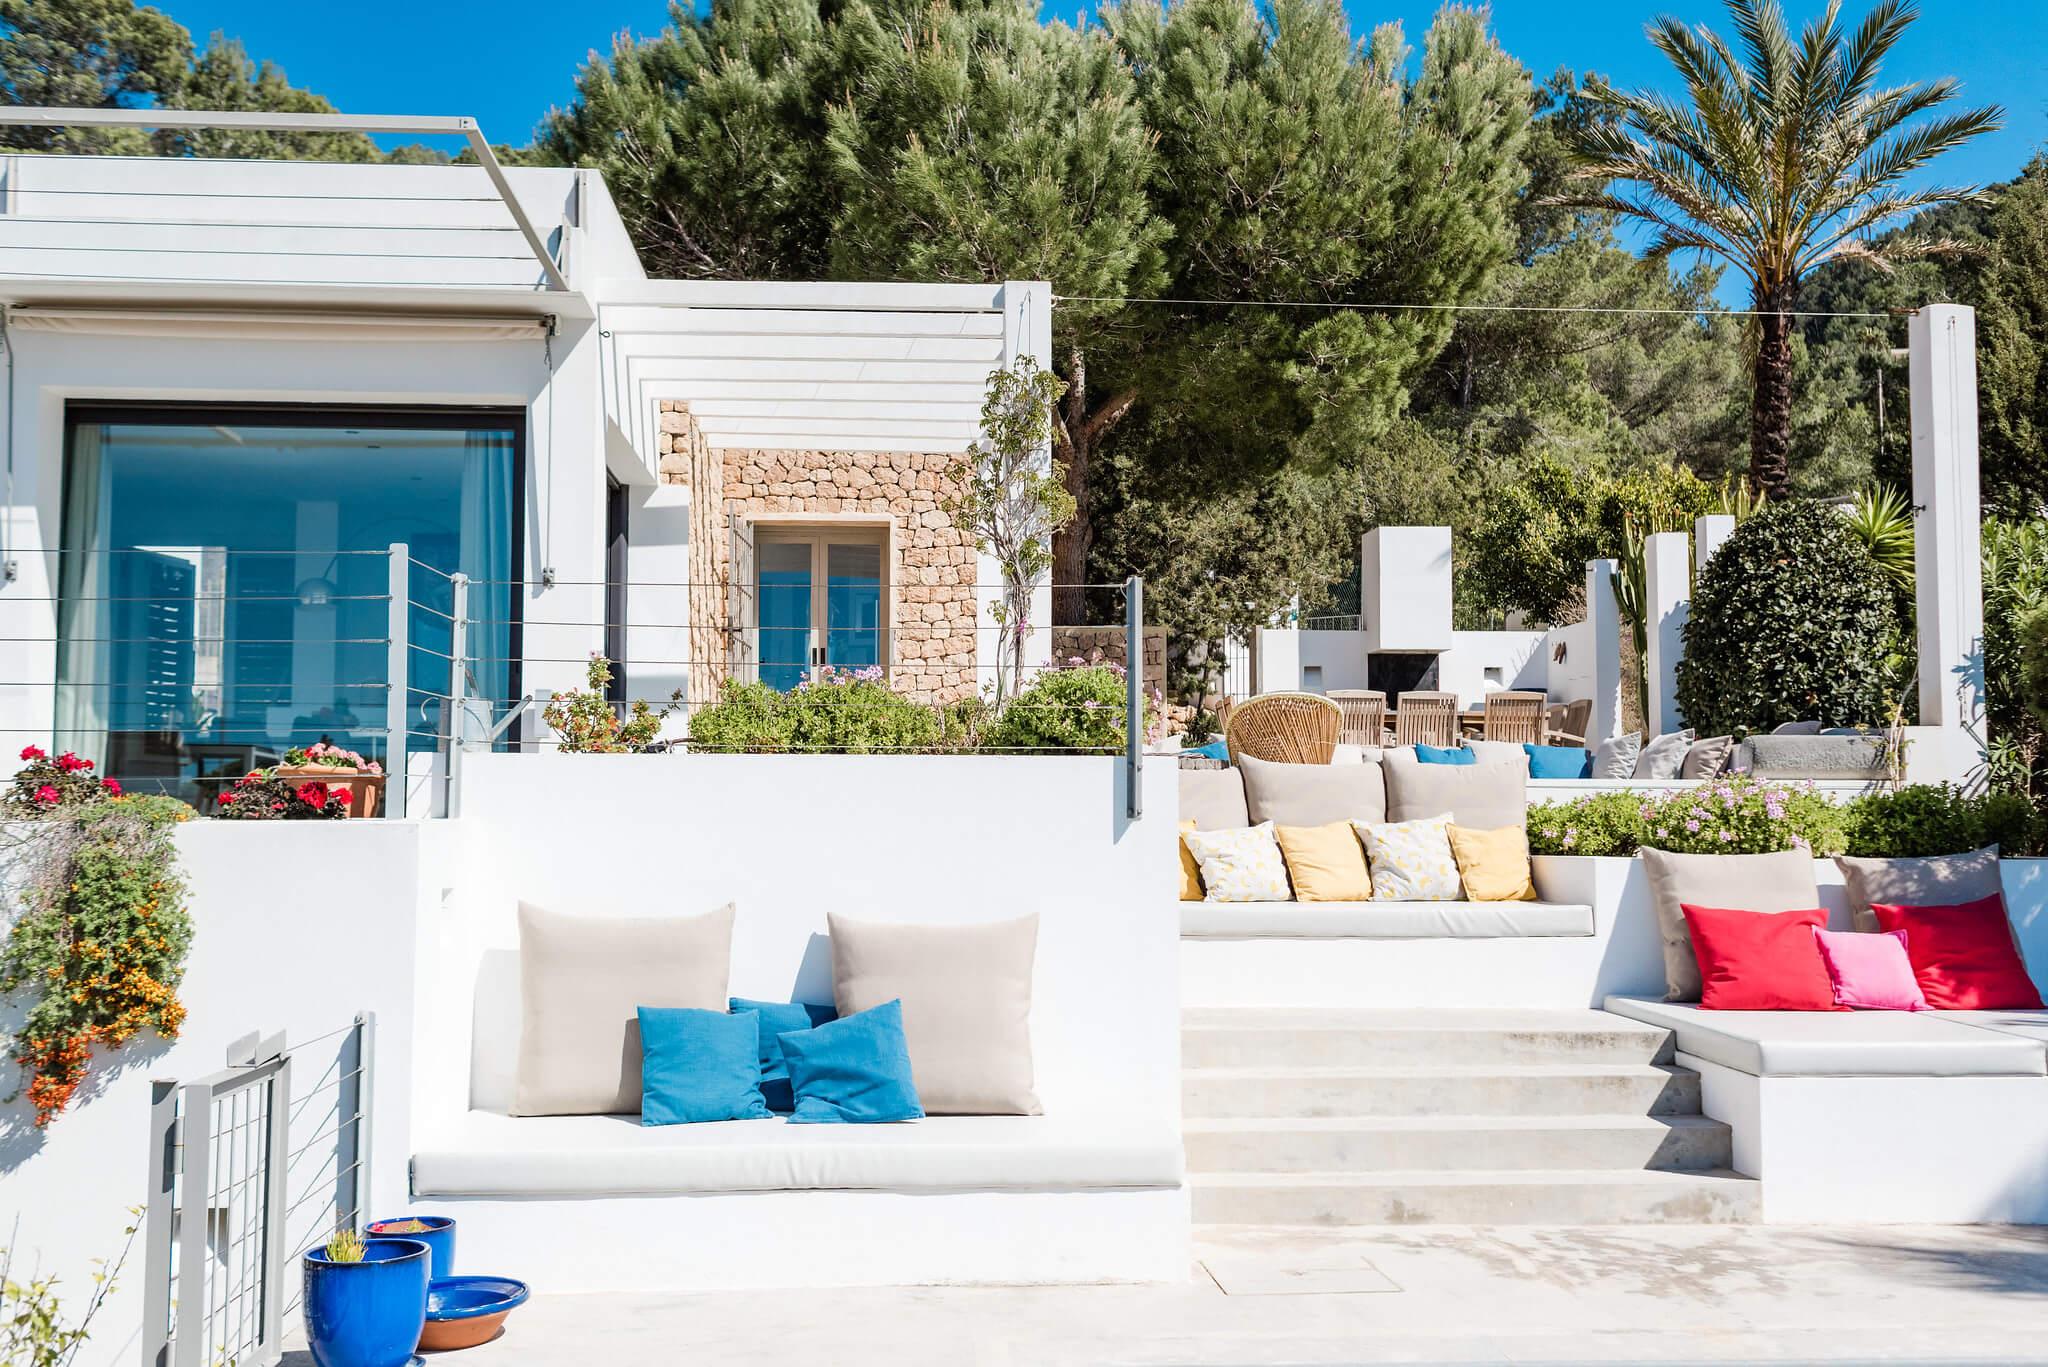 https://www.white-ibiza.com/wp-content/uploads/2020/06/white-ibiza-villas-casa-nyah-exterior-view-up.jpg